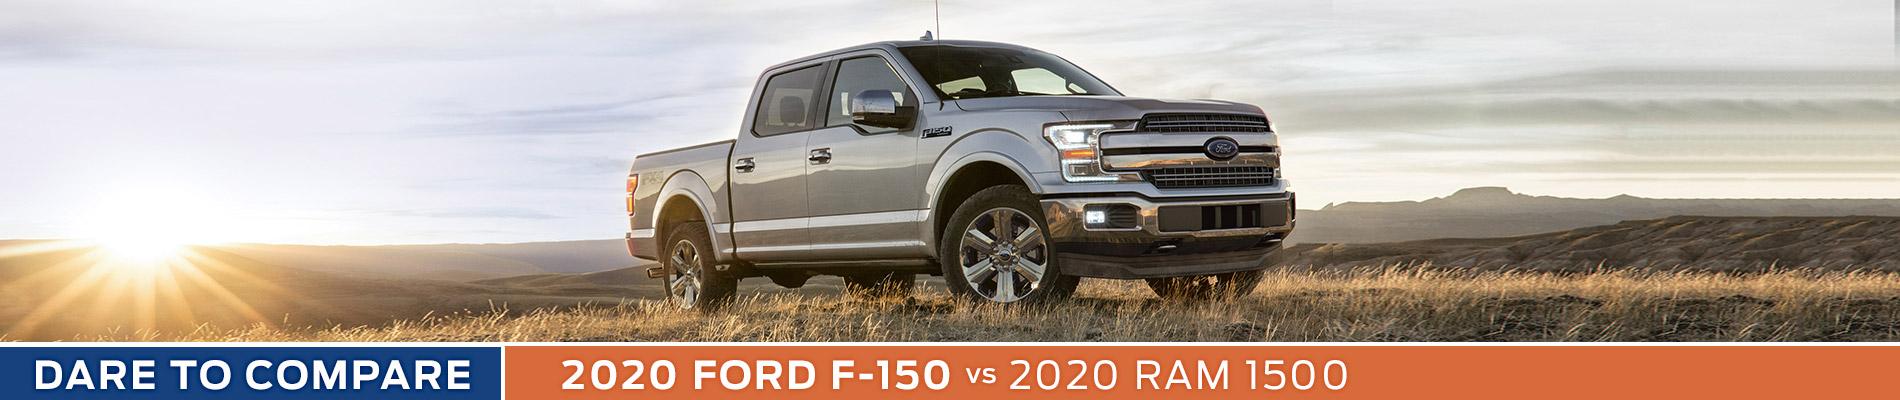 2020 Ford F-150 vs Ram 1500 - Sun State Ford - Orlando, FL